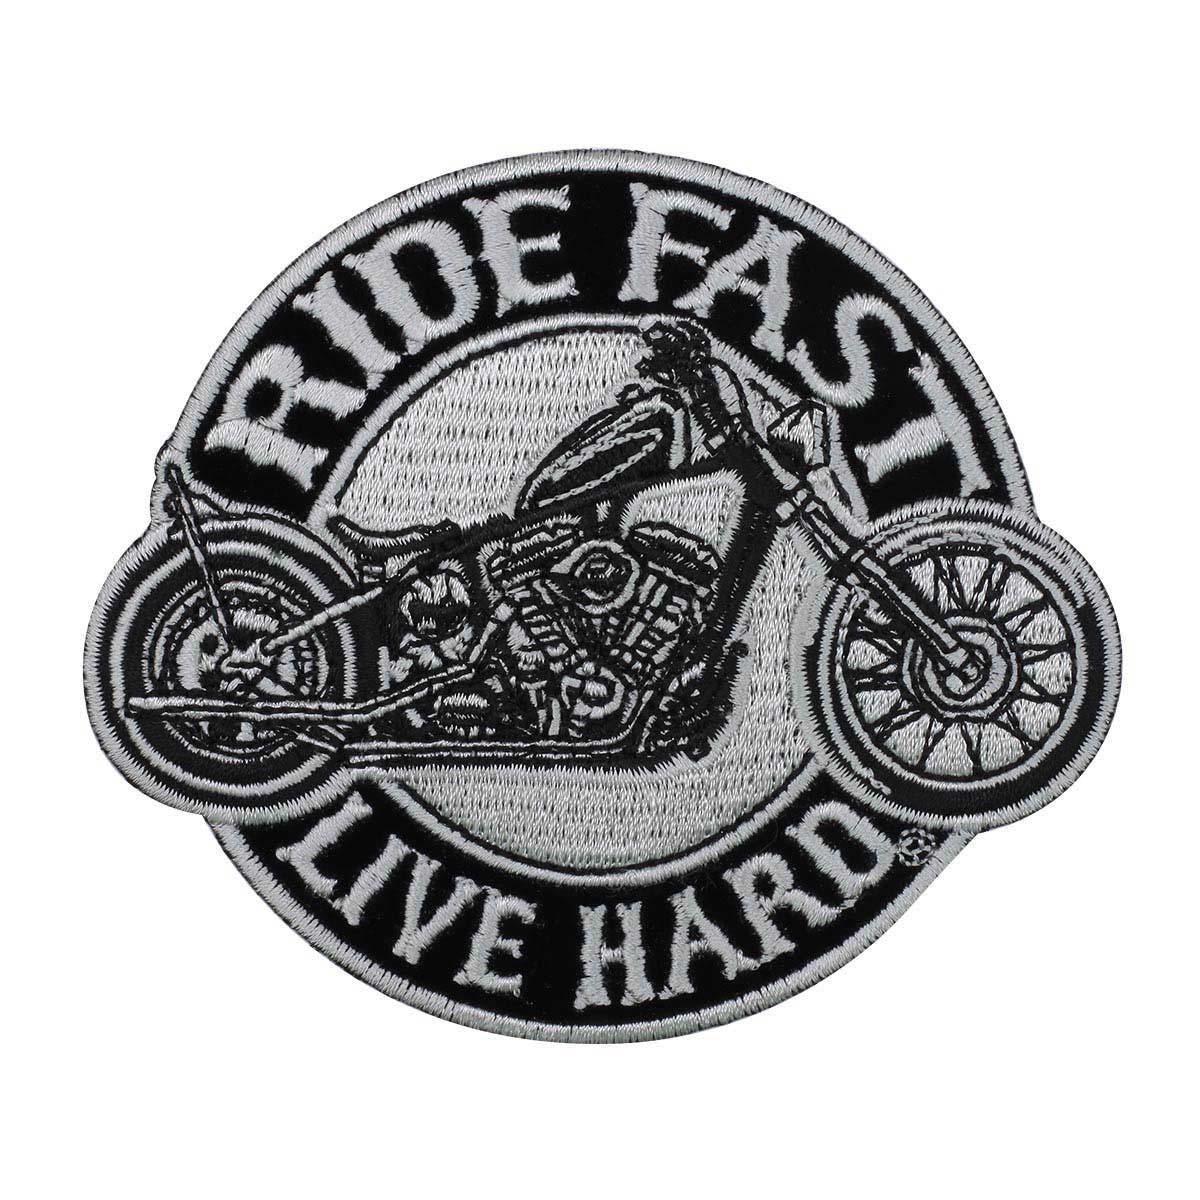 Термоаппликация 'Ride fast' 9*10,5см Hobby&Pro